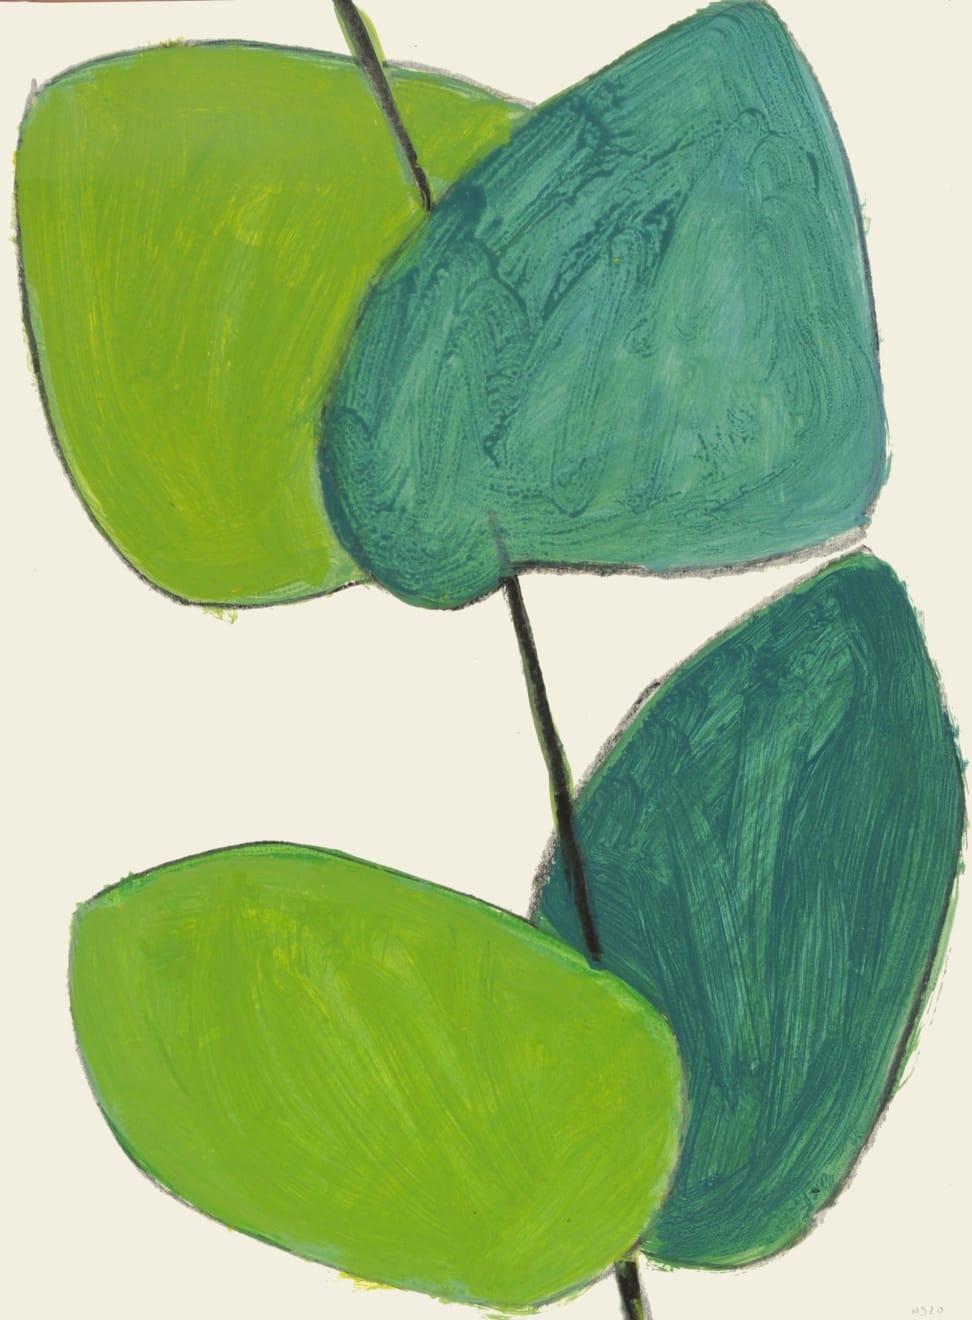 Summer Auction 2020, LOT 129 - Nigel Swift - 'Leaves XV', 2020